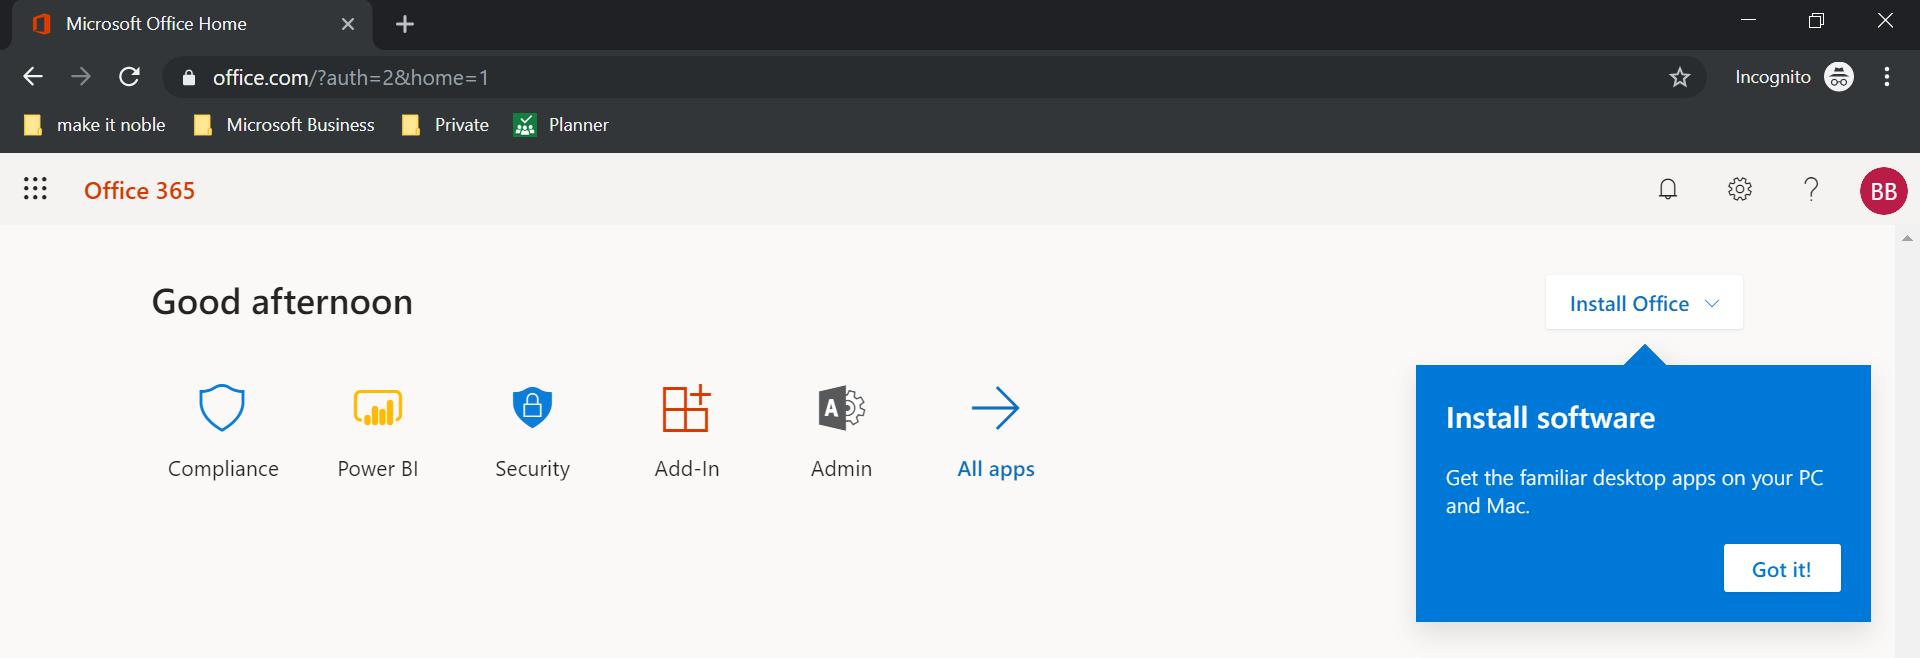 Portal login azure